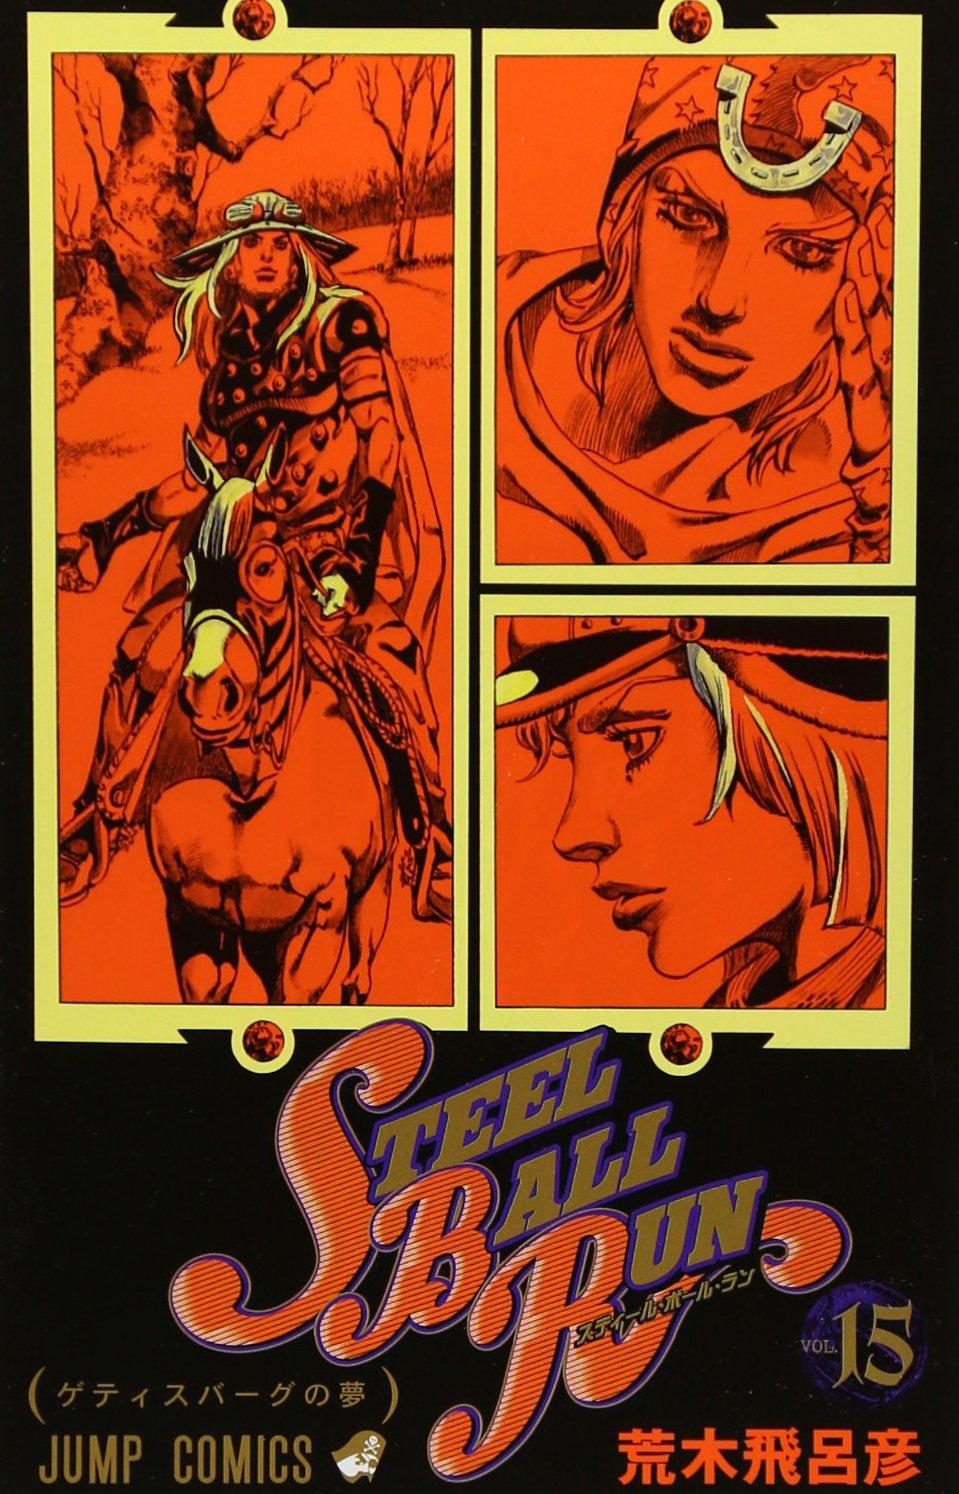 Download スティール・ボール・ラン #15 ジャンプコミックス: ゲティスバ-グの夢 (JoJo's Bizarre Adventure #95, Part 7, Steel Ball Run #15) ebook